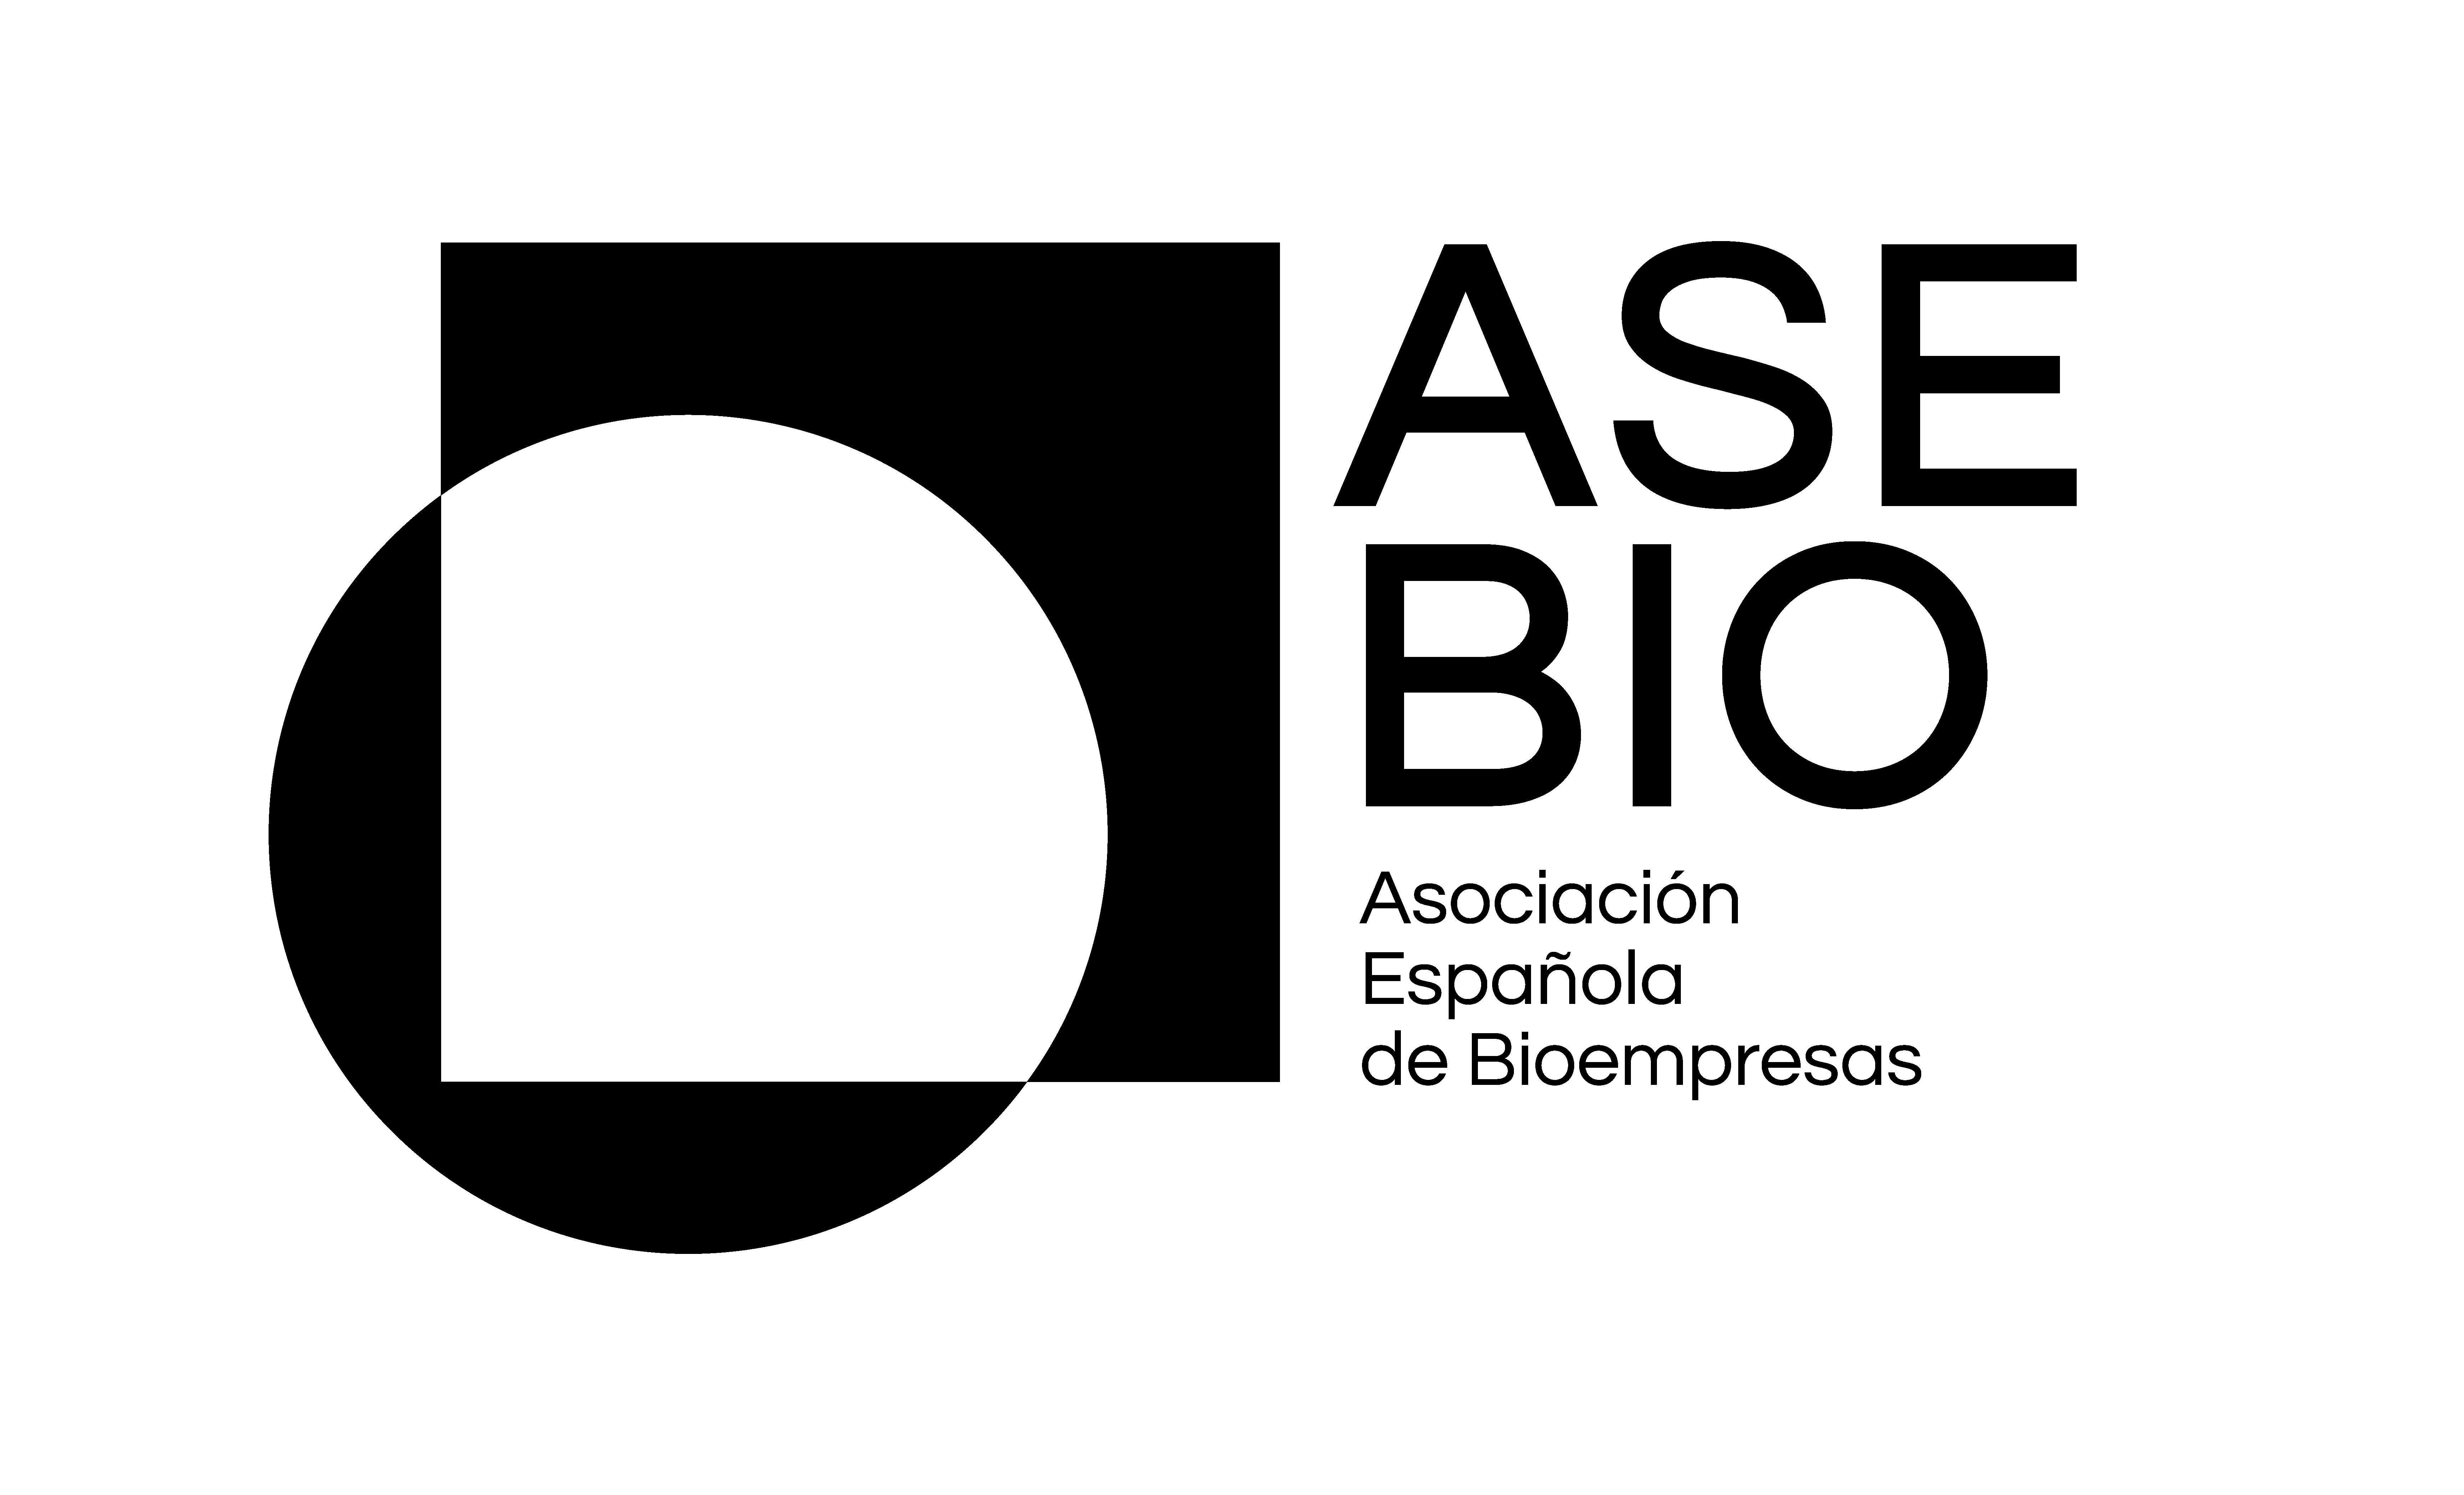 Logo Asociación Española de Bioempresas (AseBio)